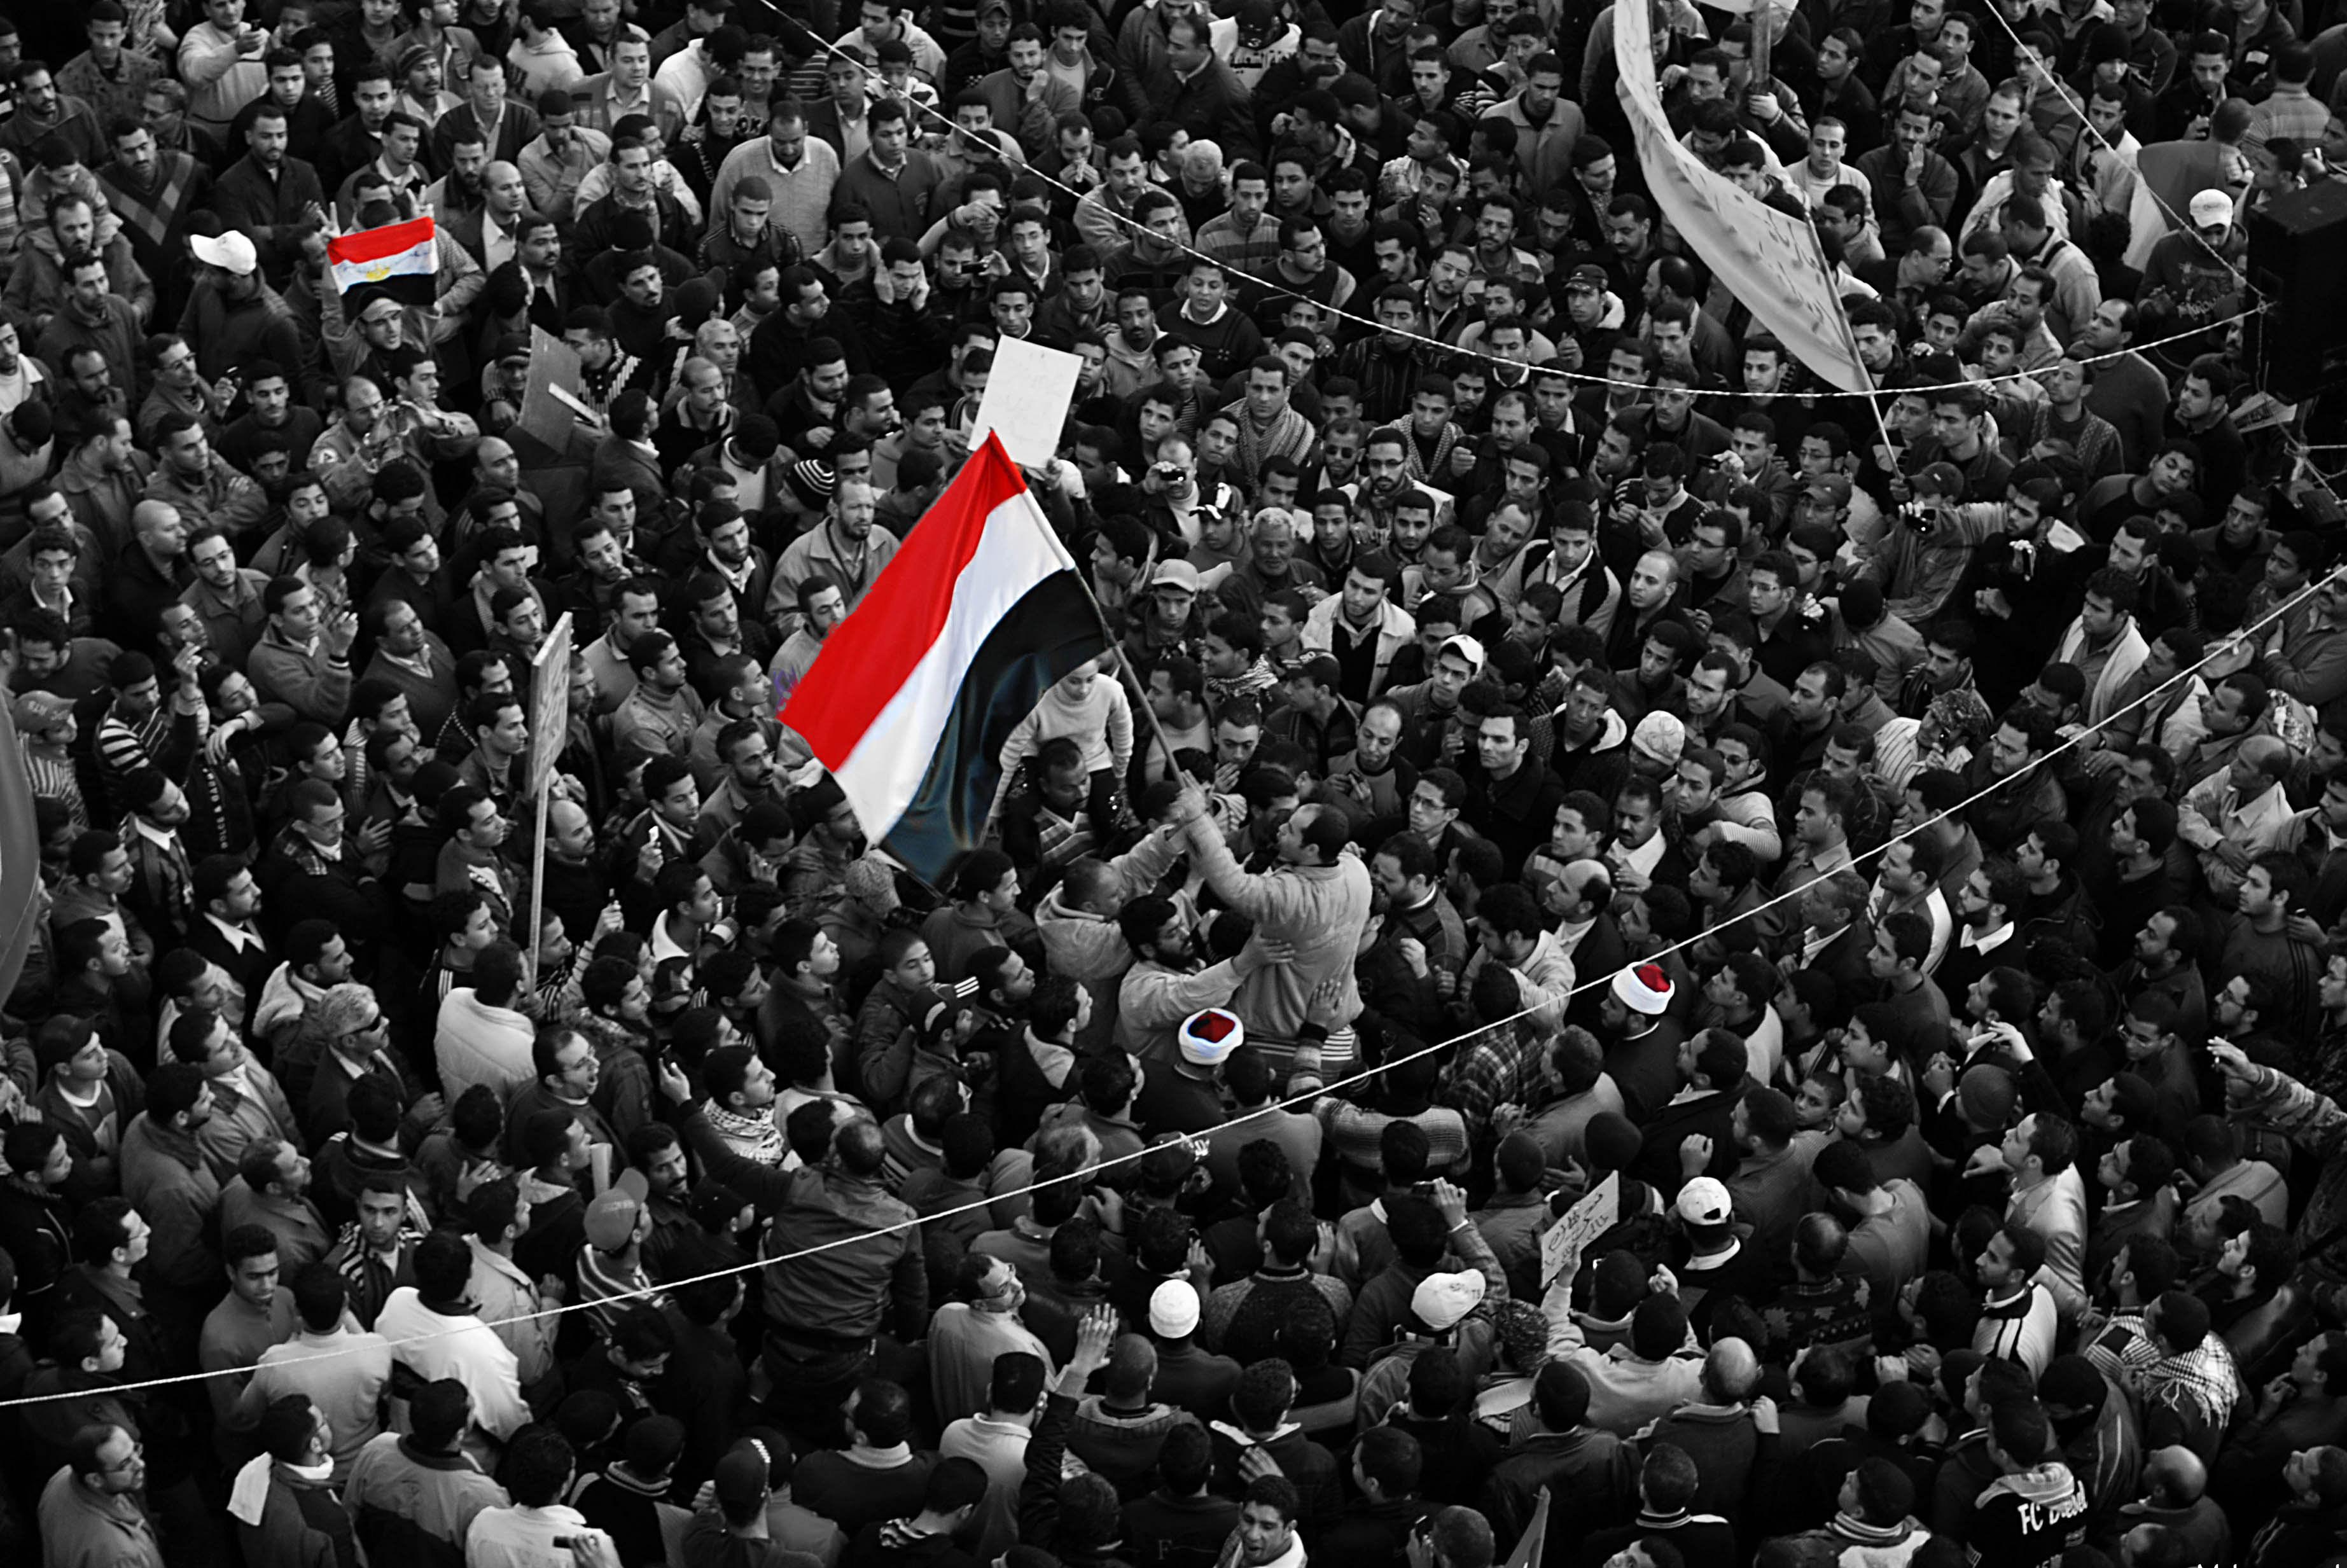 File:ثورة 25 ينـايـر.jpg